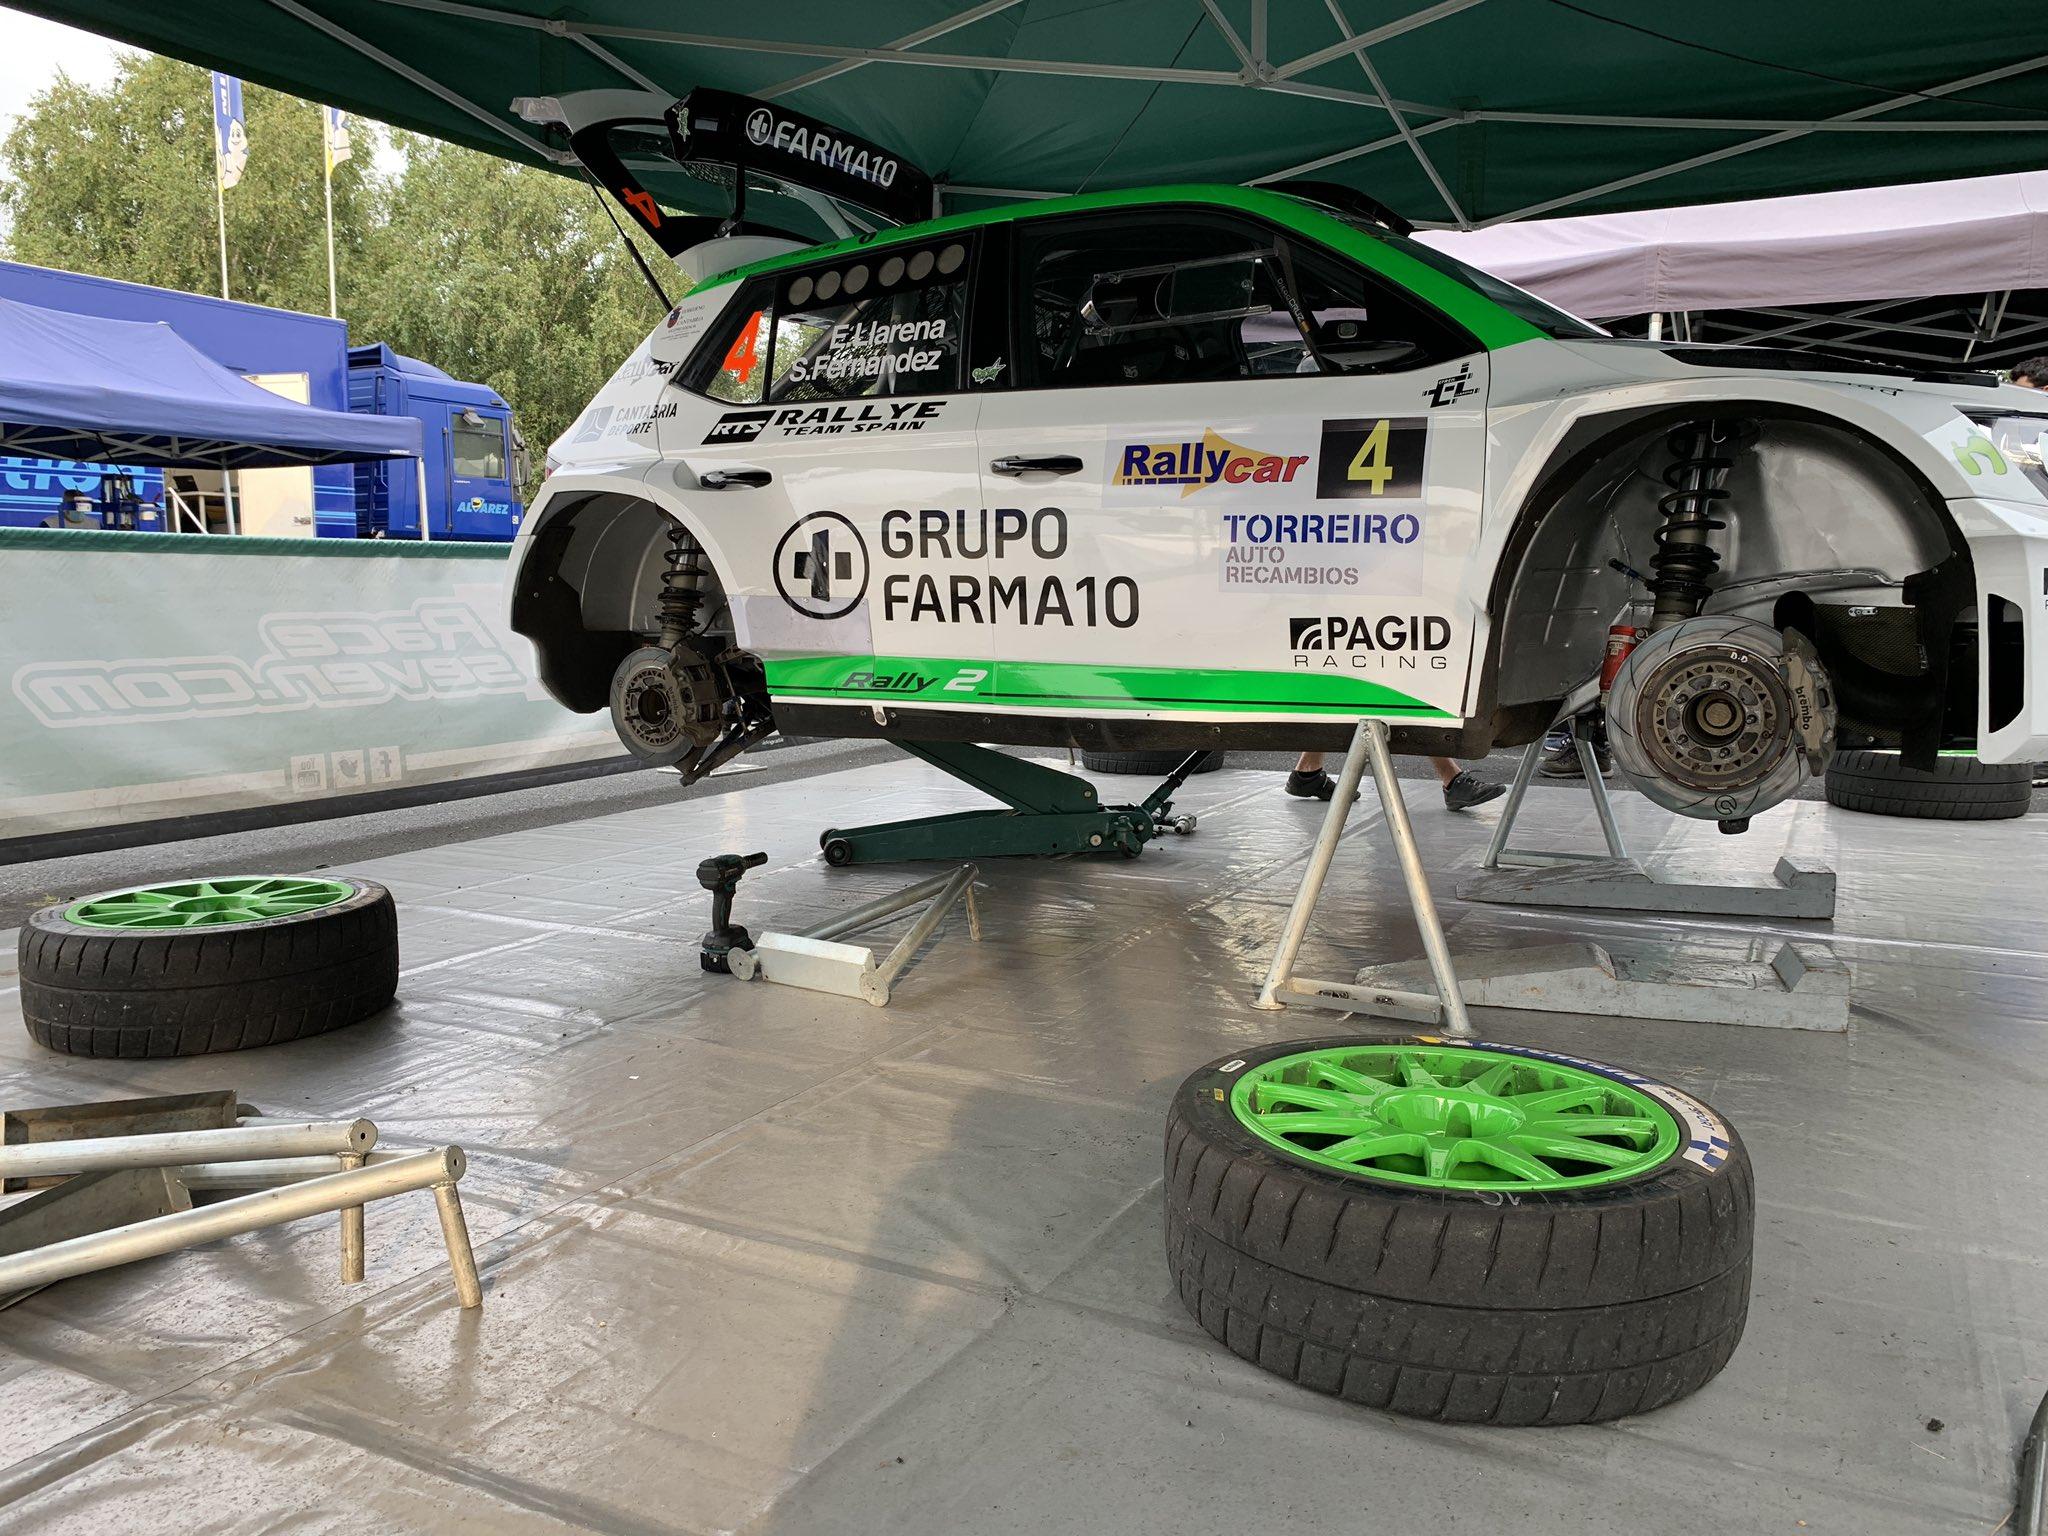 SCER + TER: 52º Rallye de Ferrol - Suzuki [20-21 Agosto] - Página 2 E9TK9TuXMAE8Bjw?format=jpg&name=large